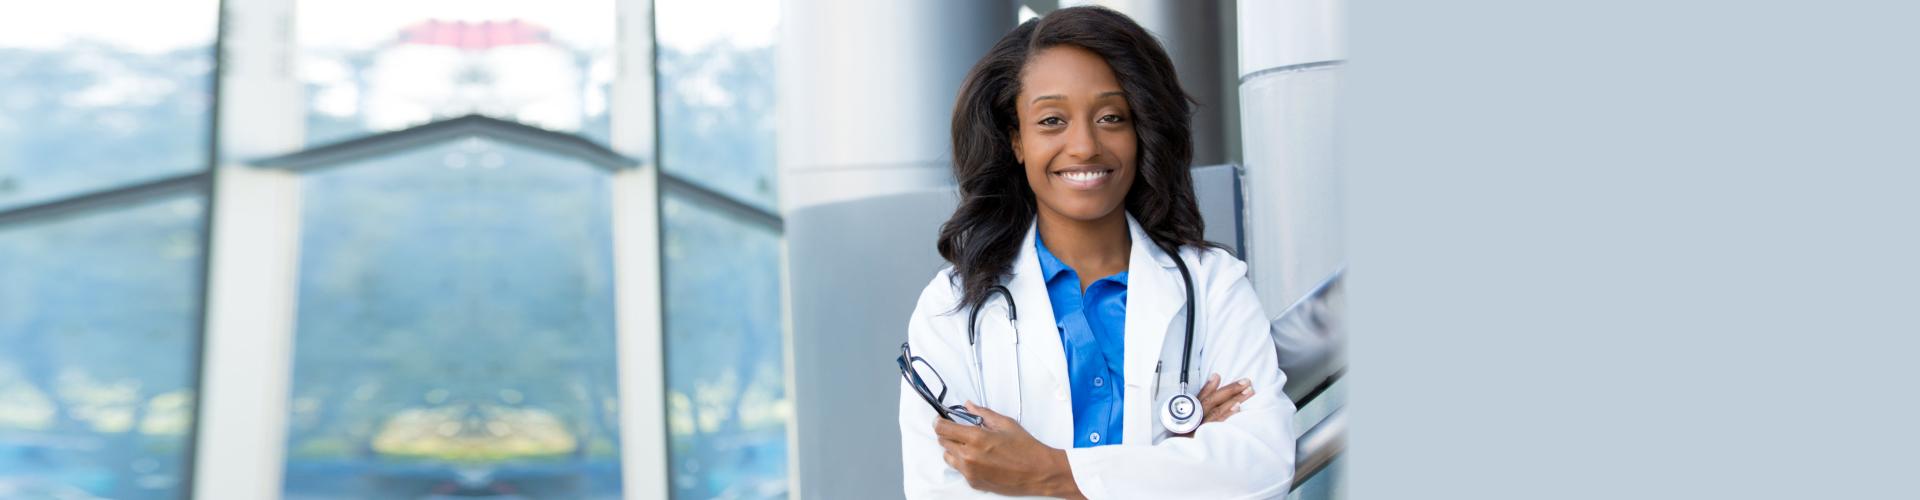 Closeup headshot portrait of female healthcare professional with lab coat